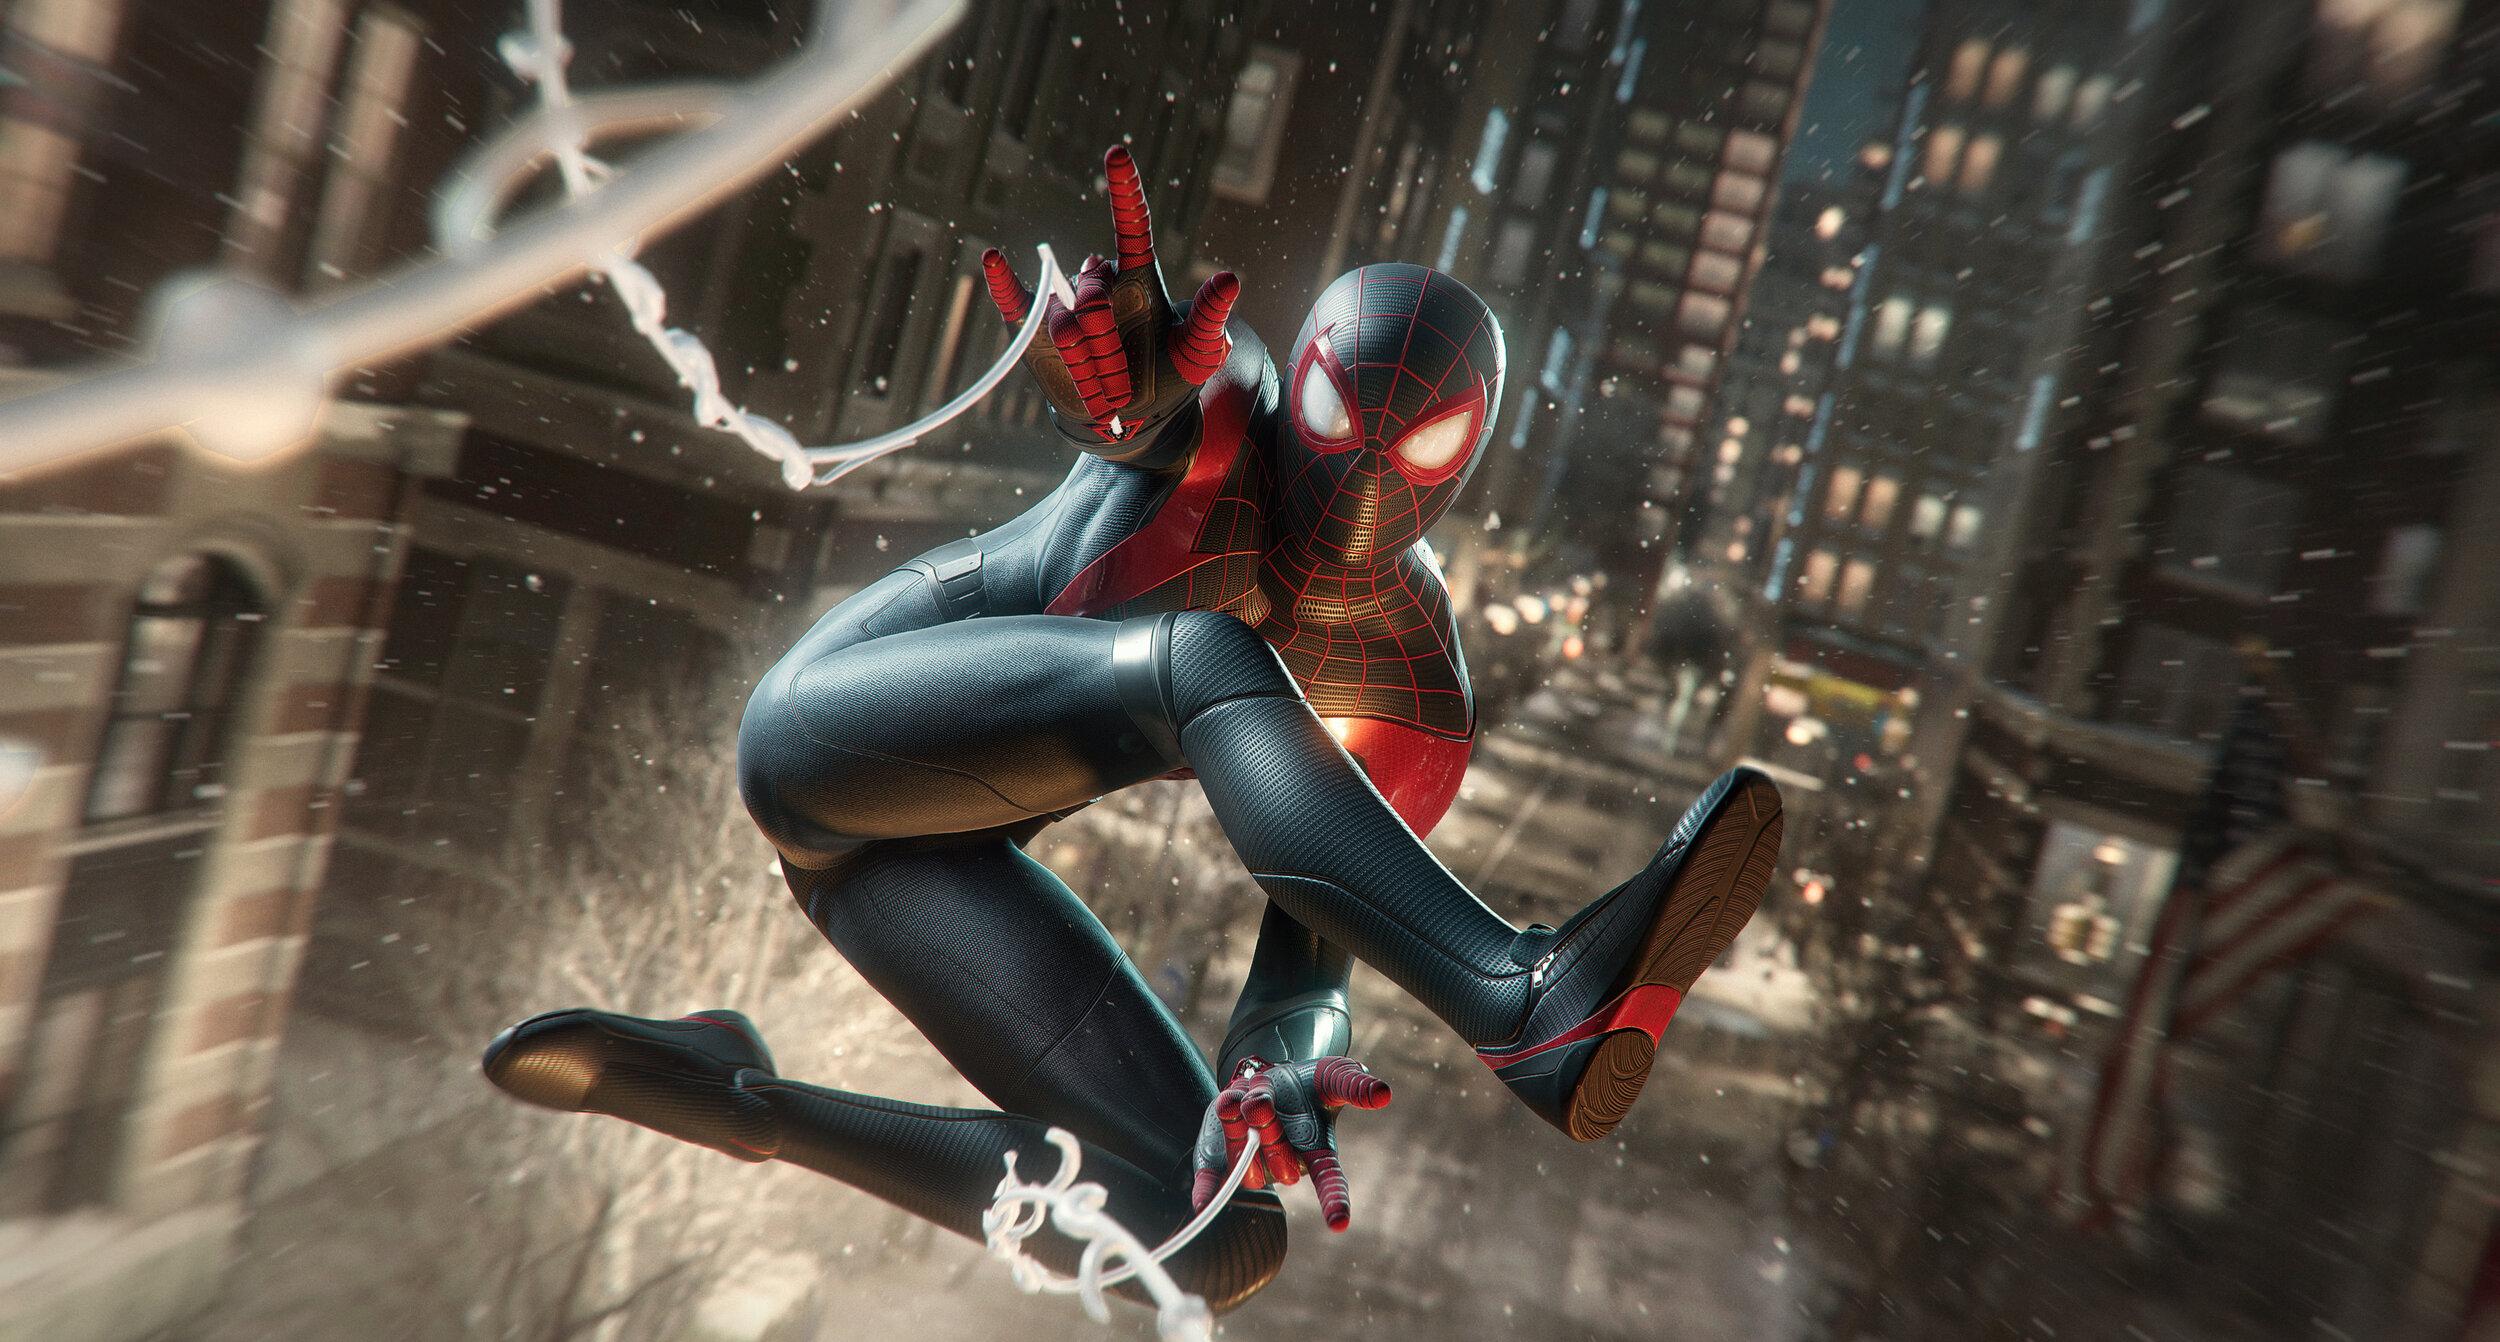 marvels spider man miles morales hd wallpaper 72406